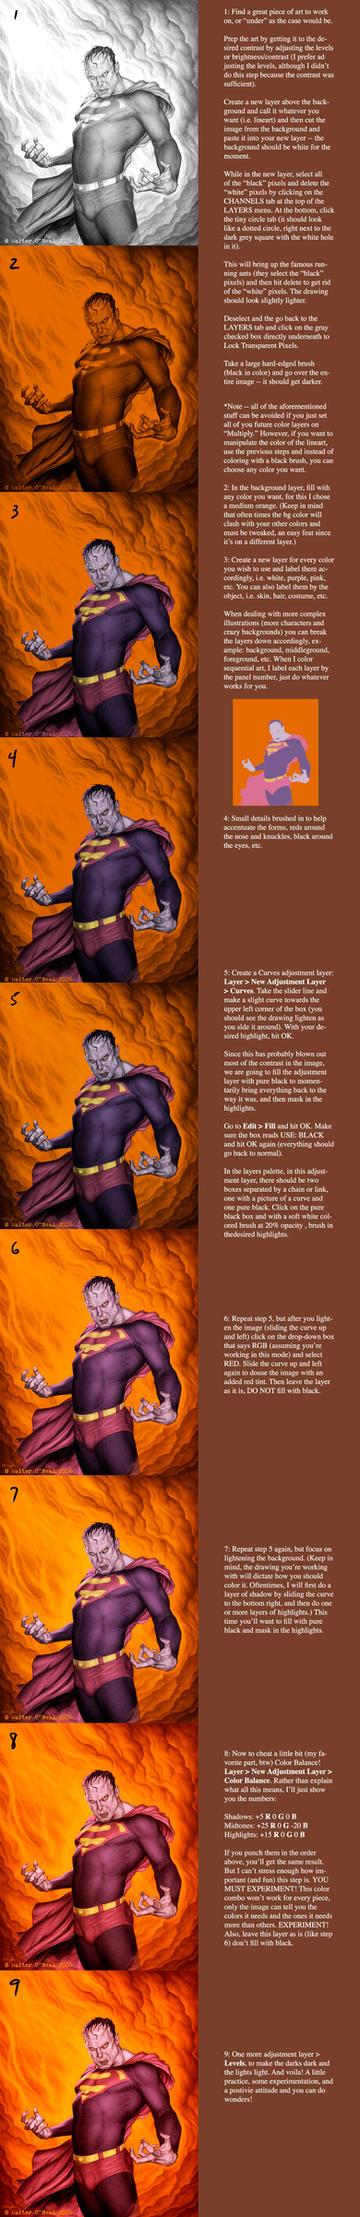 Color Tutorial 1 by StephenSchaffer